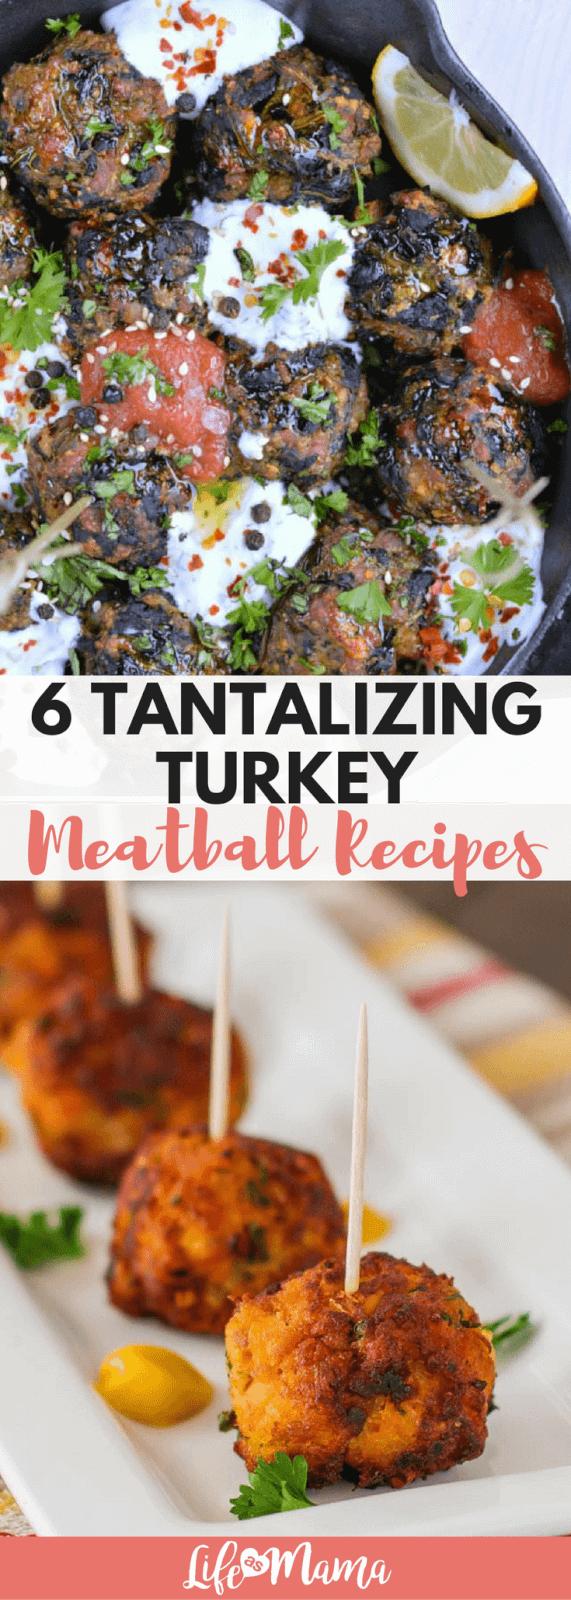 turkey meatball